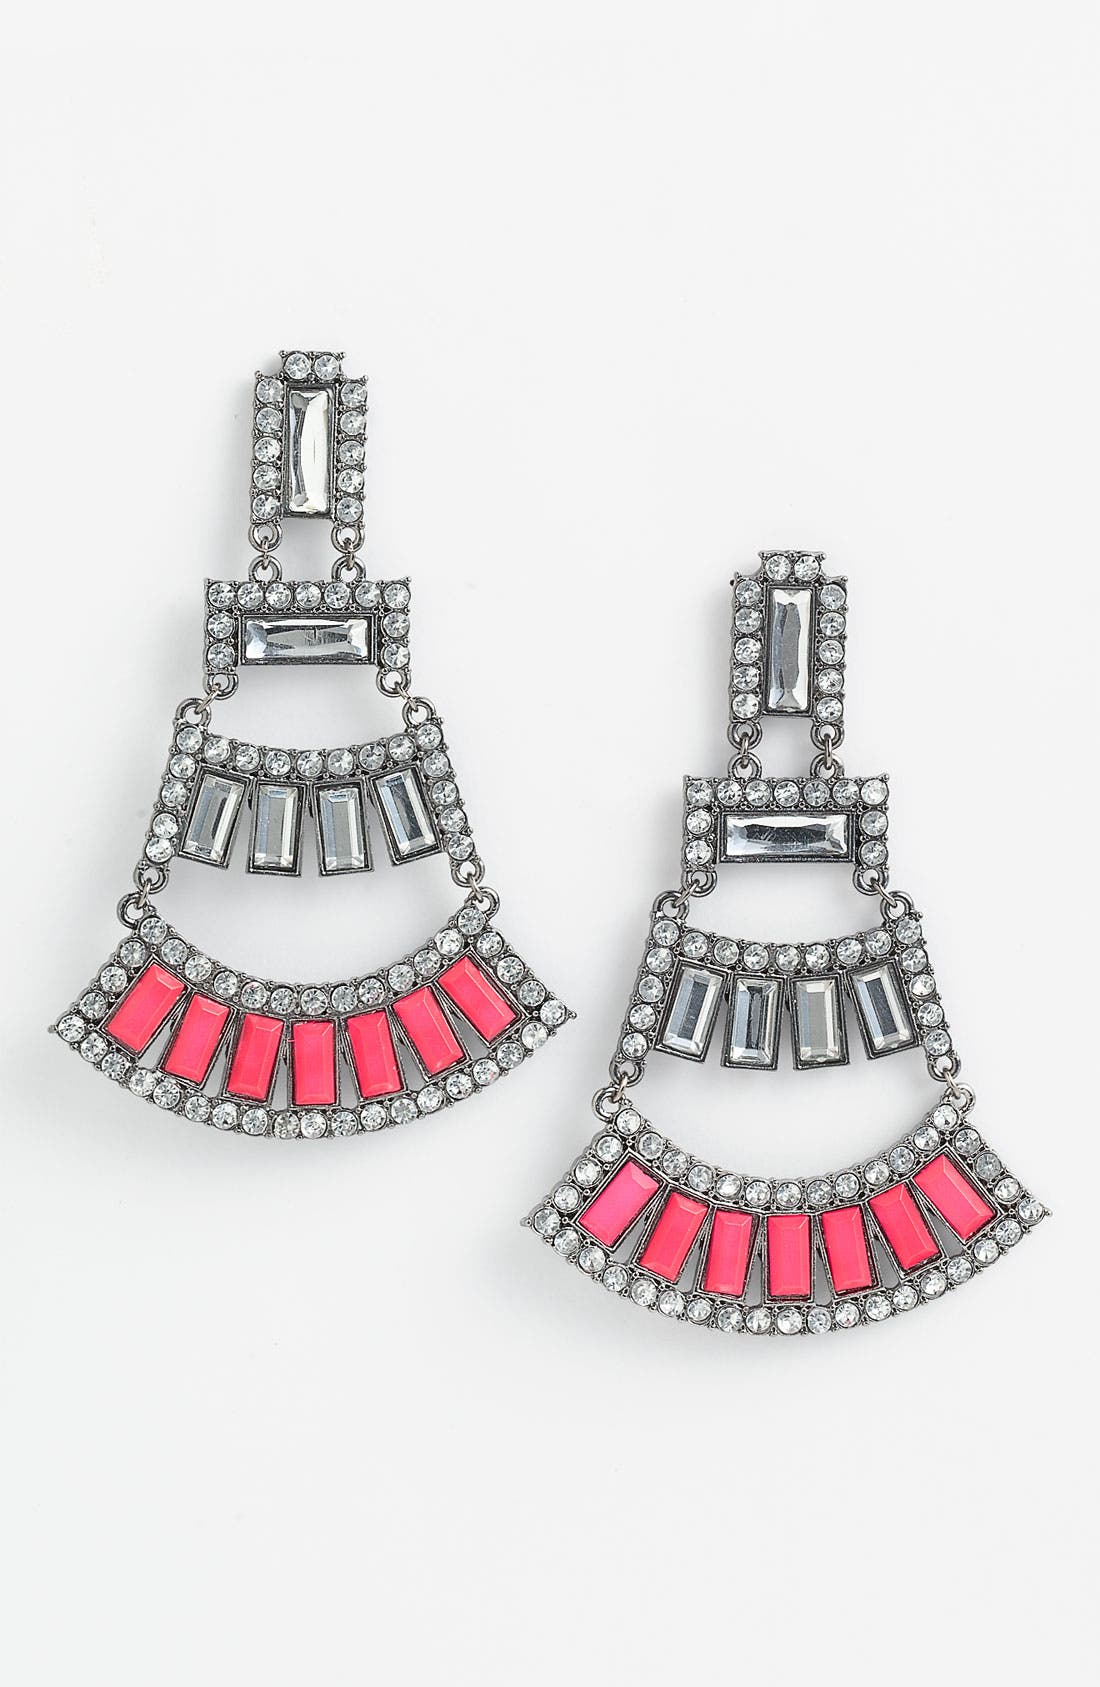 Main Image - Jewelry Fashions Bead & Crystal Earrings